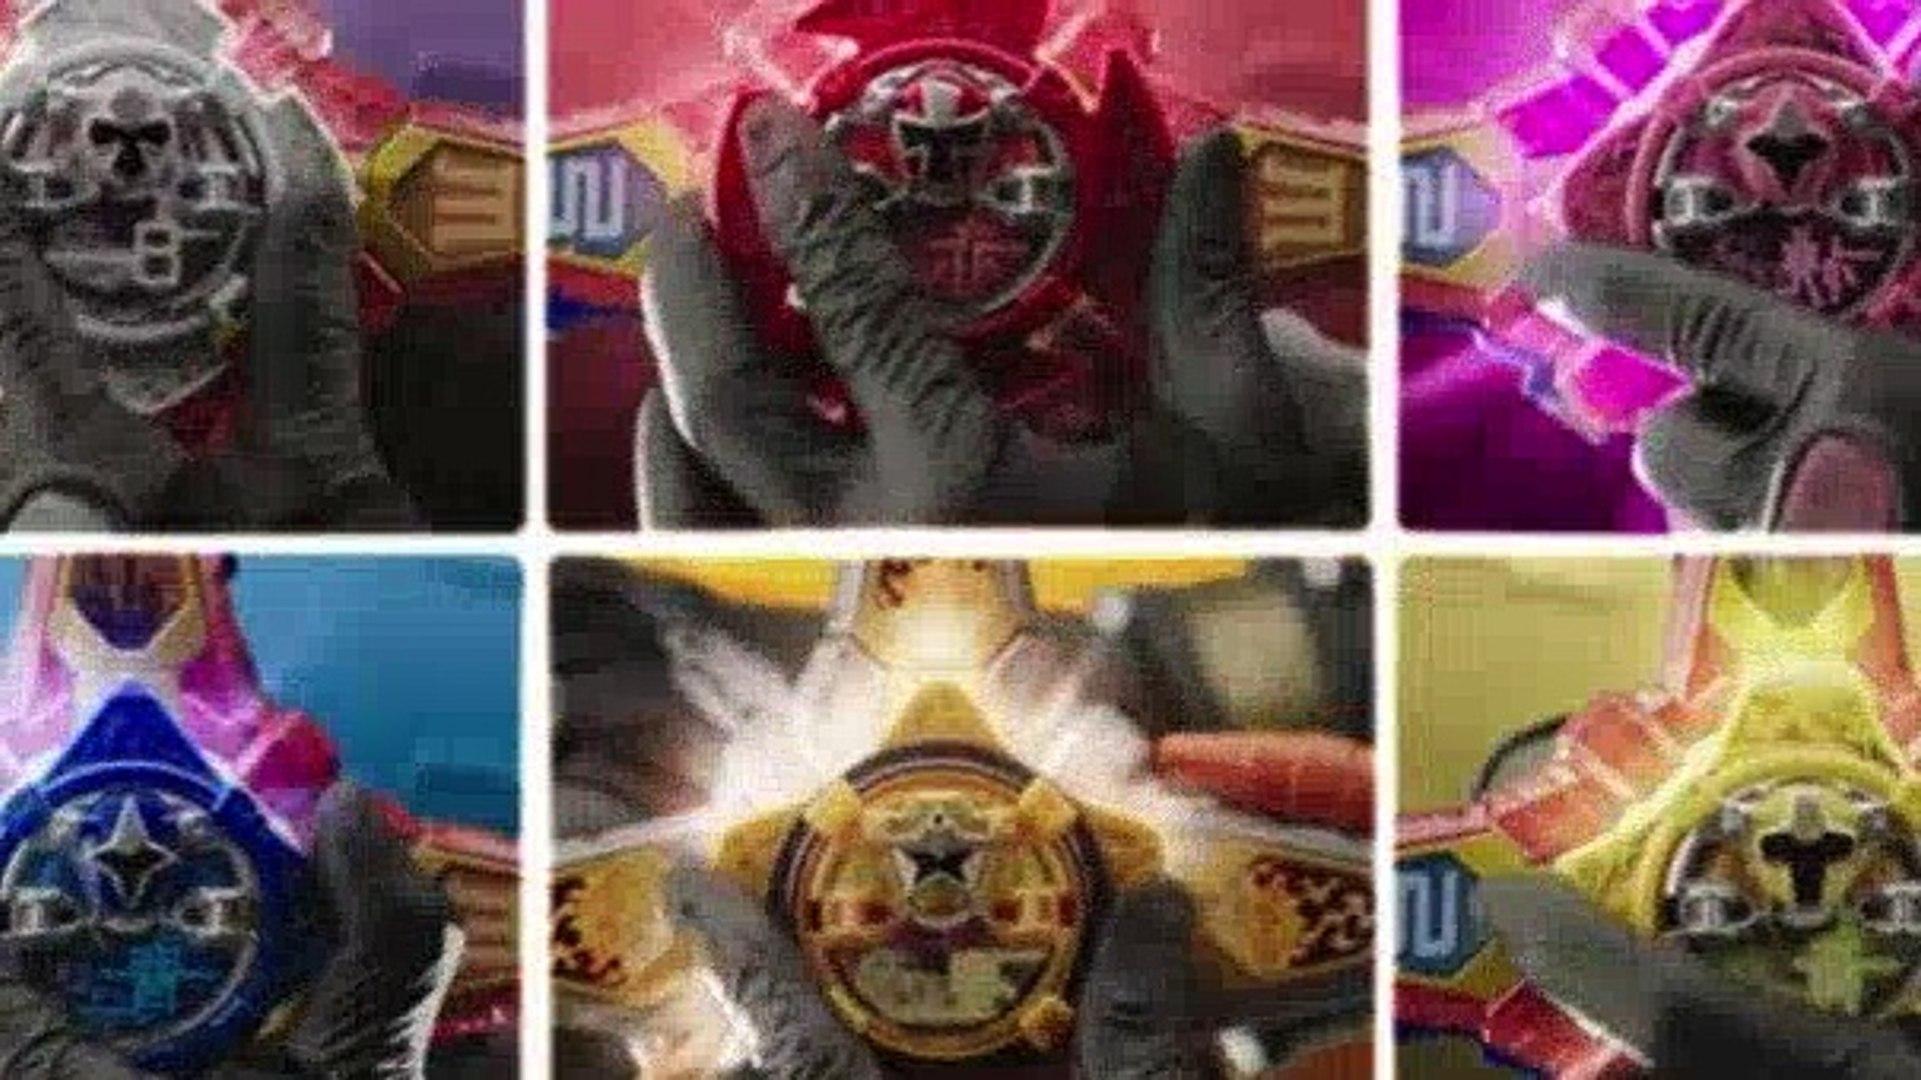 Power Rangers Super Ninja Steel Episode 9 Outfoxed